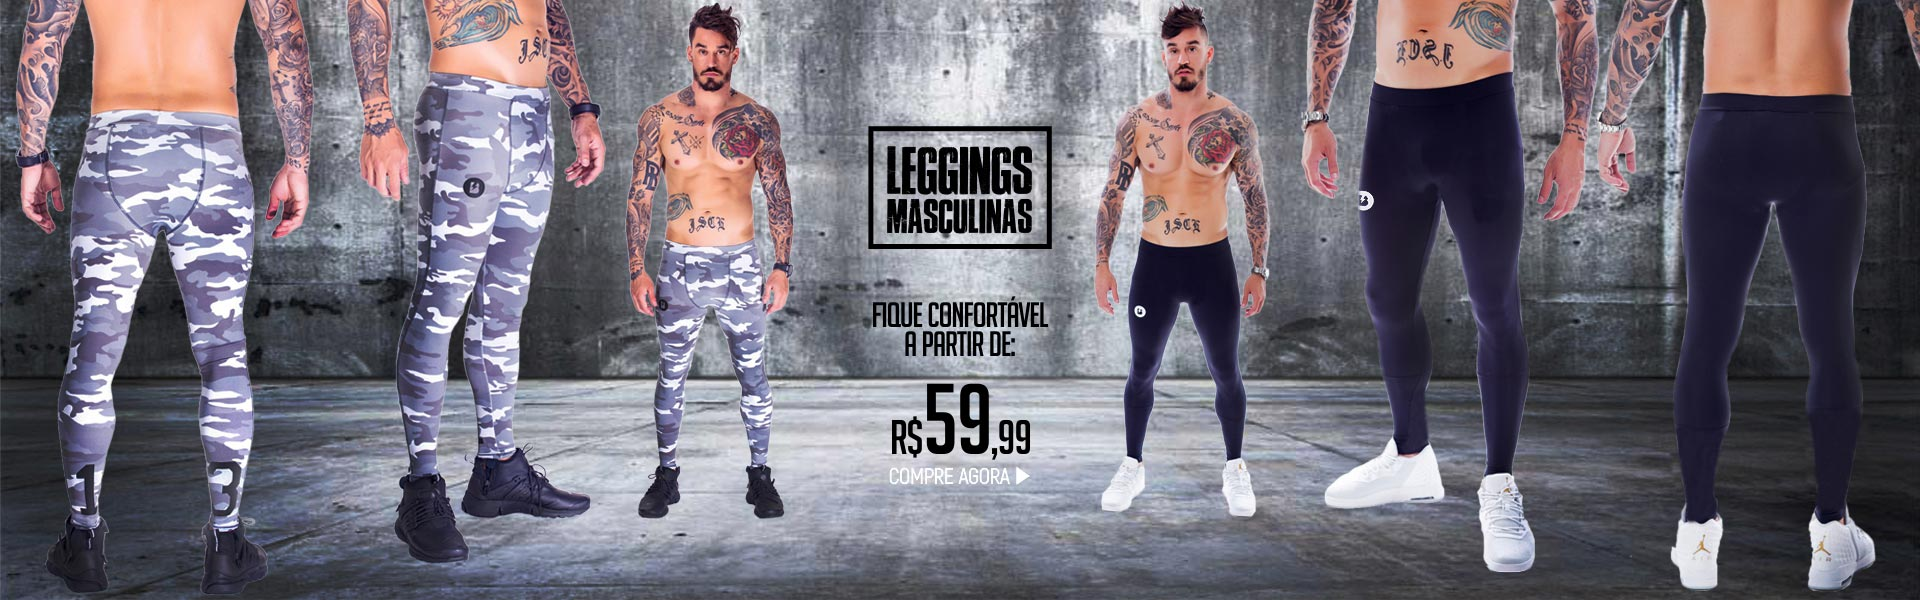 Legging masculina